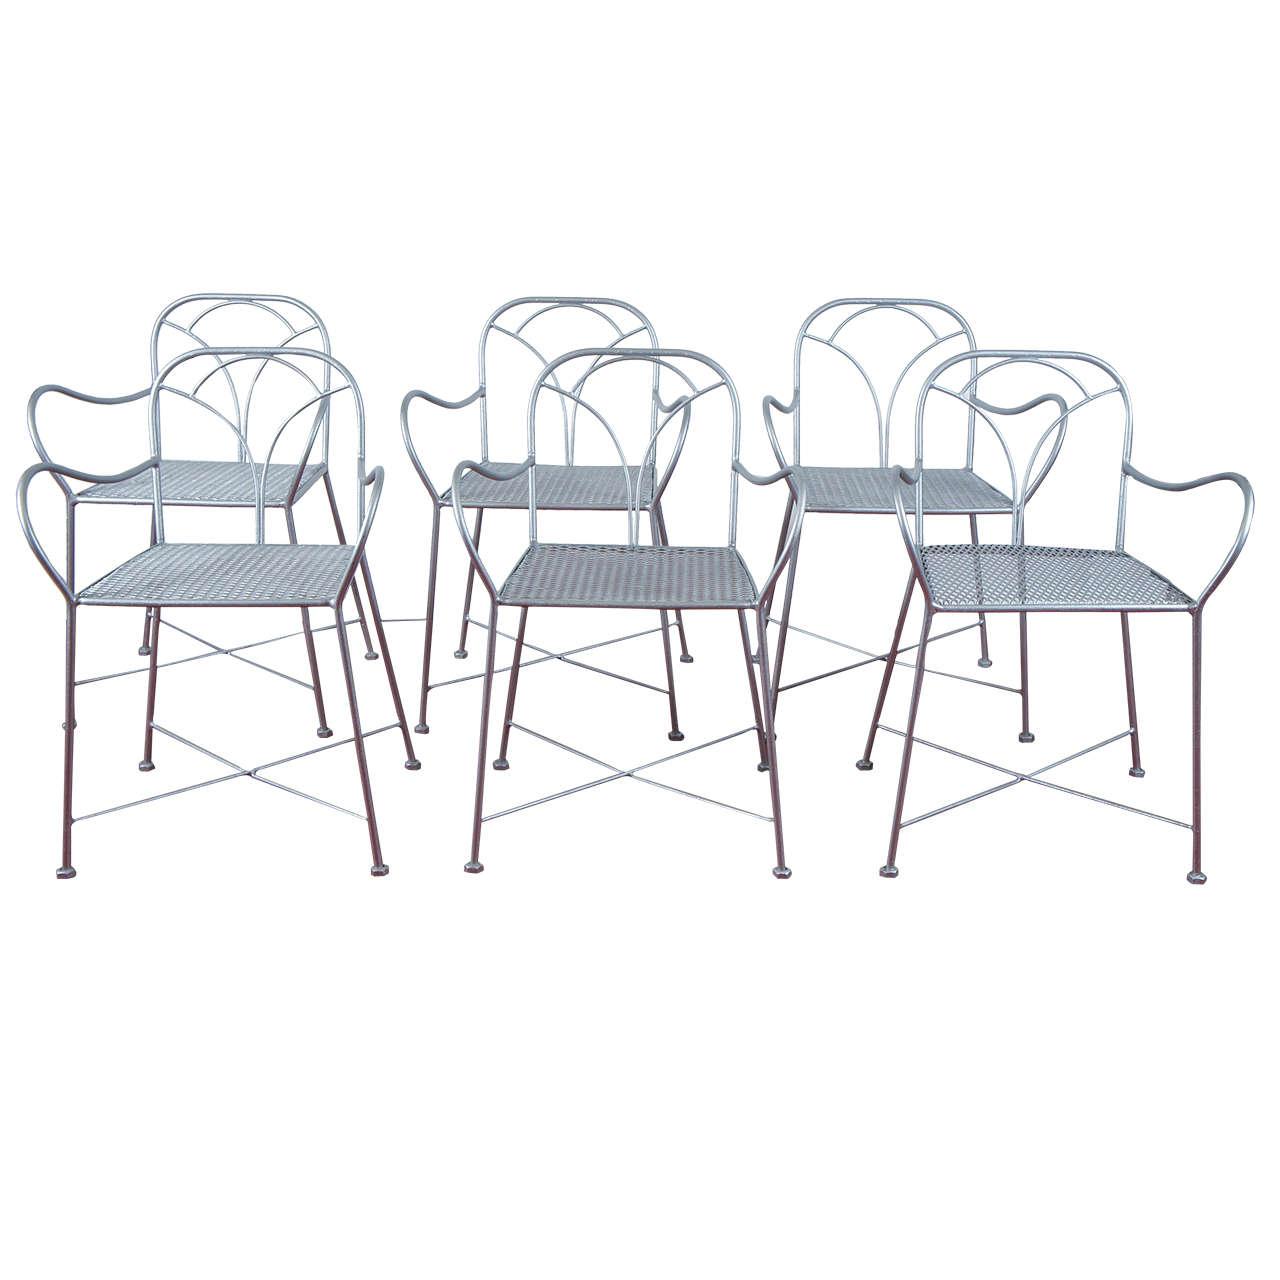 Six Art Deco Parisian Garden Chairs